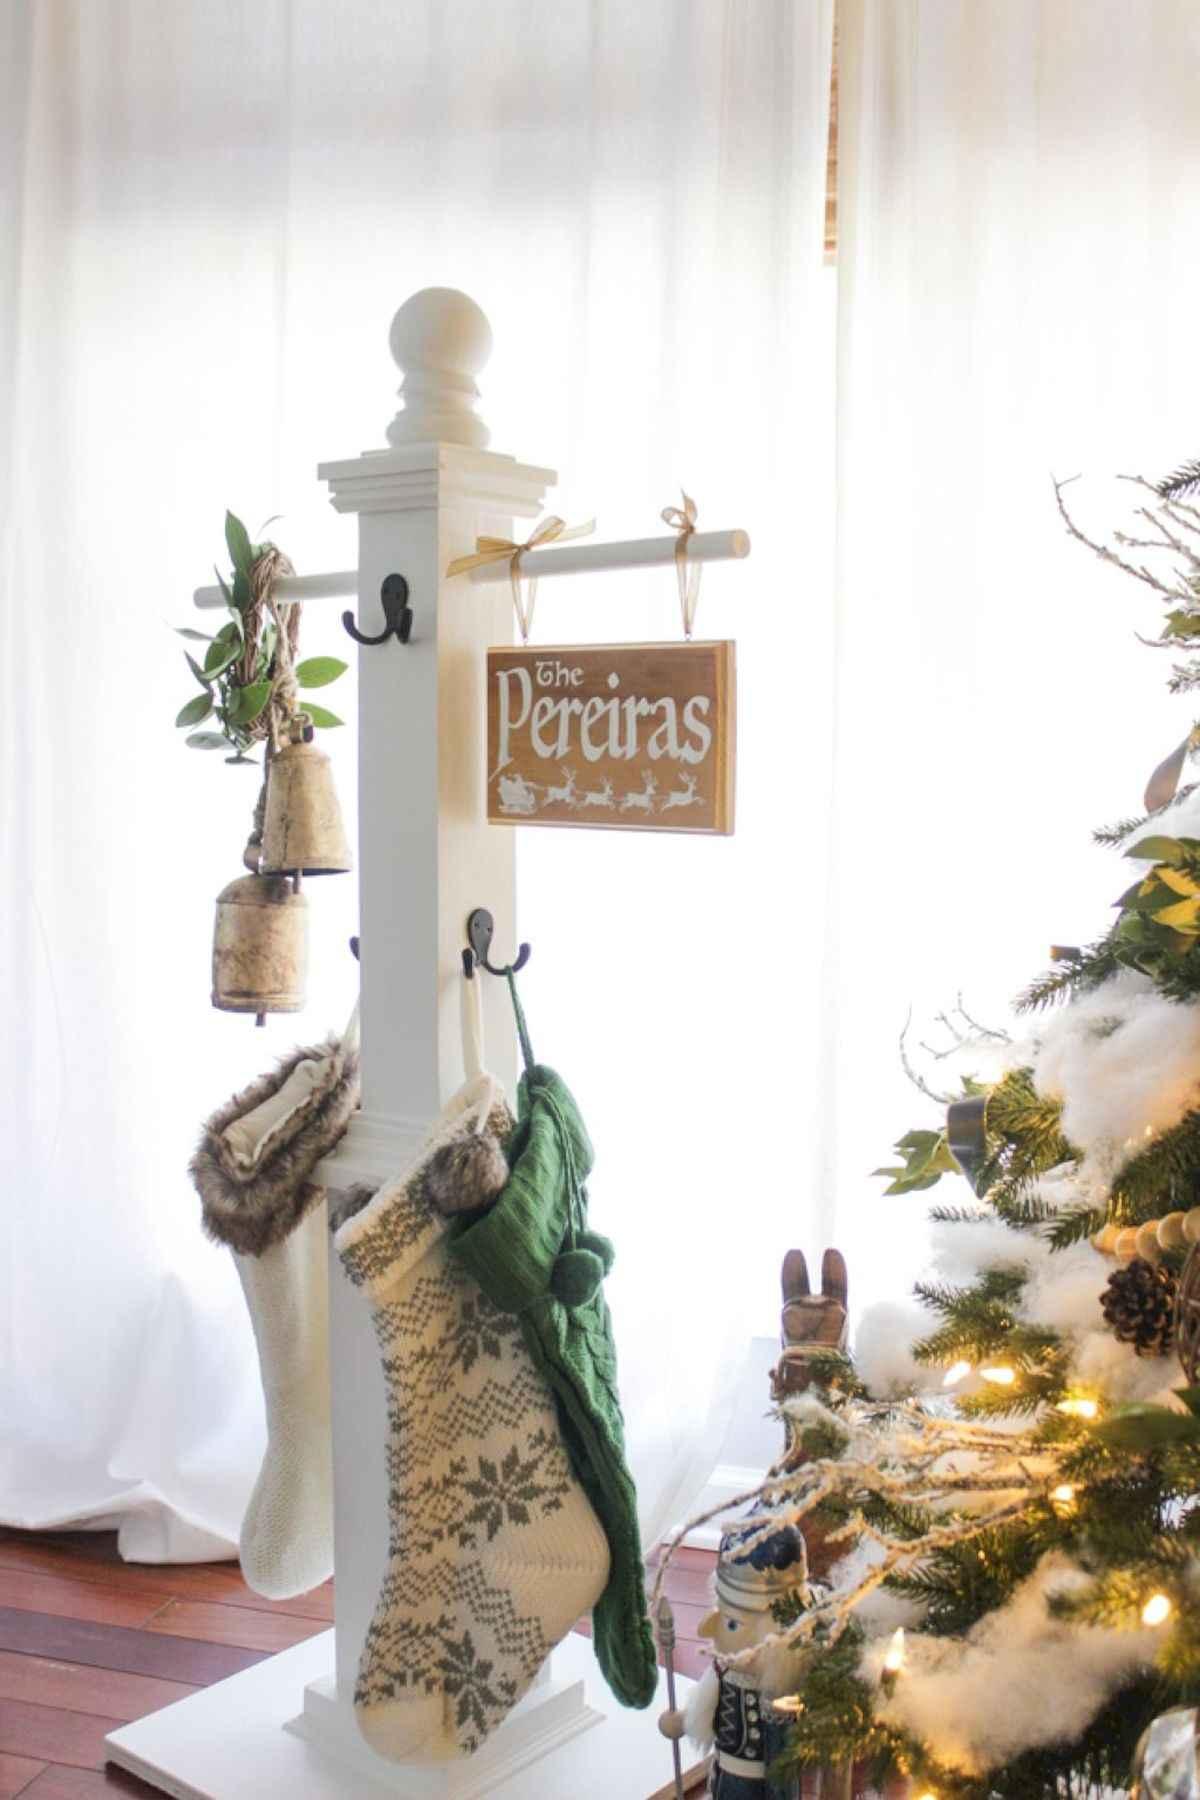 ... 1200 × 1800 in 60 Best Farmhouse Christmas Decorating Ideas ...